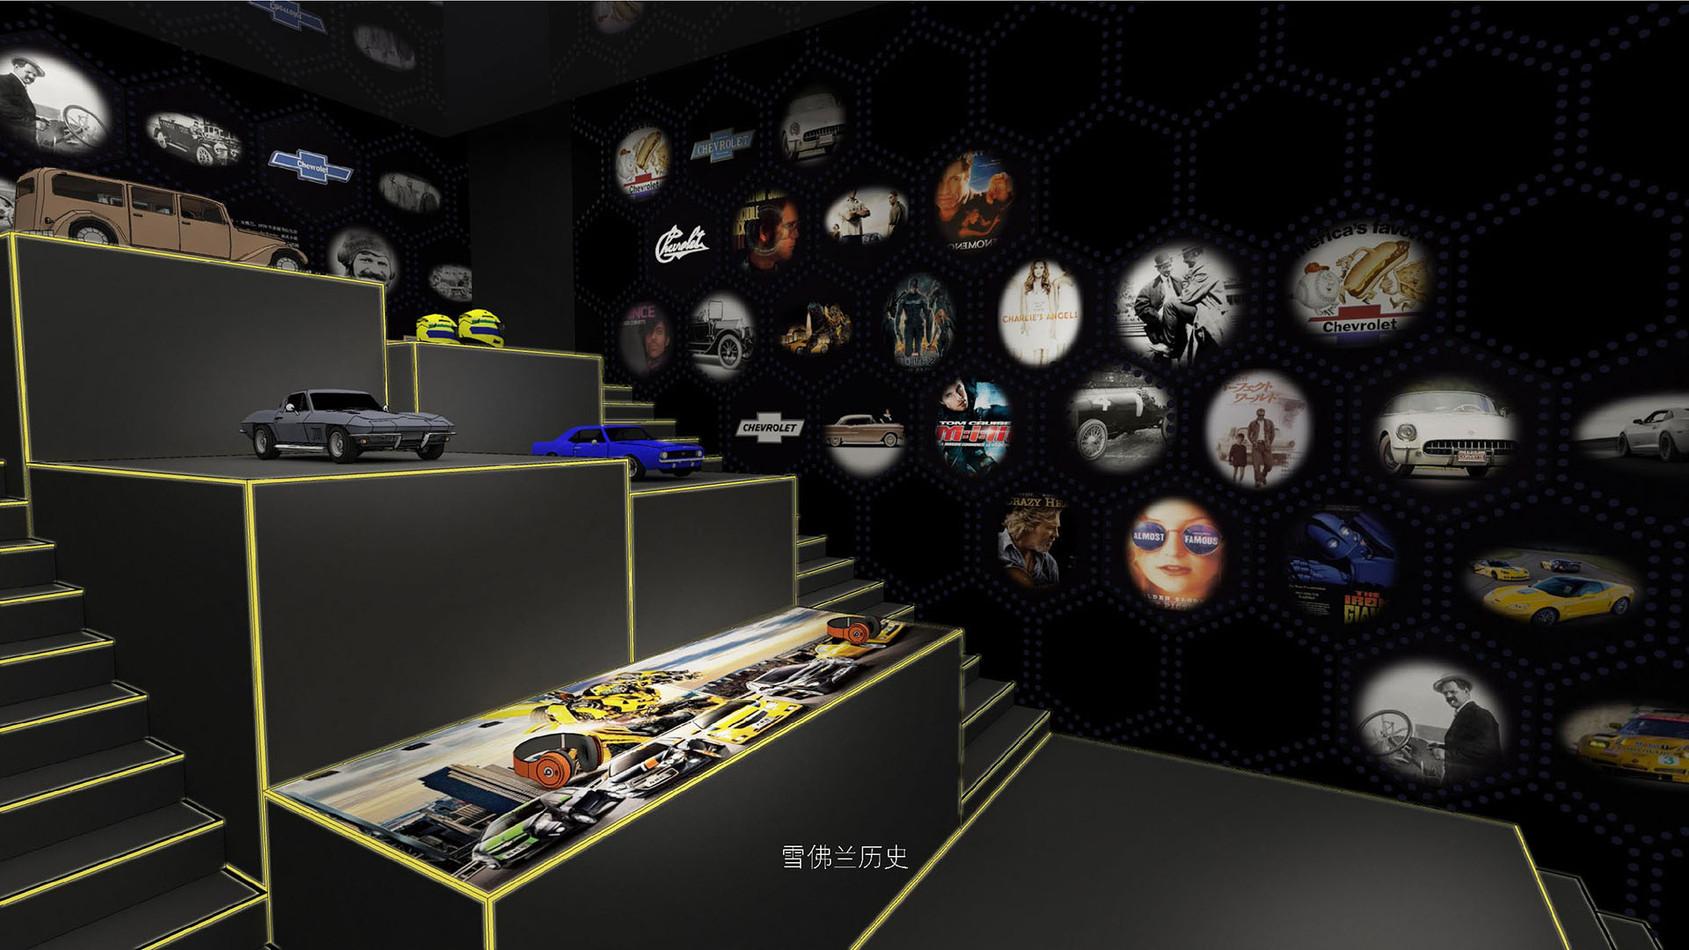 SGM-CORPORATE-MUSEUM-ZH 45.jpg